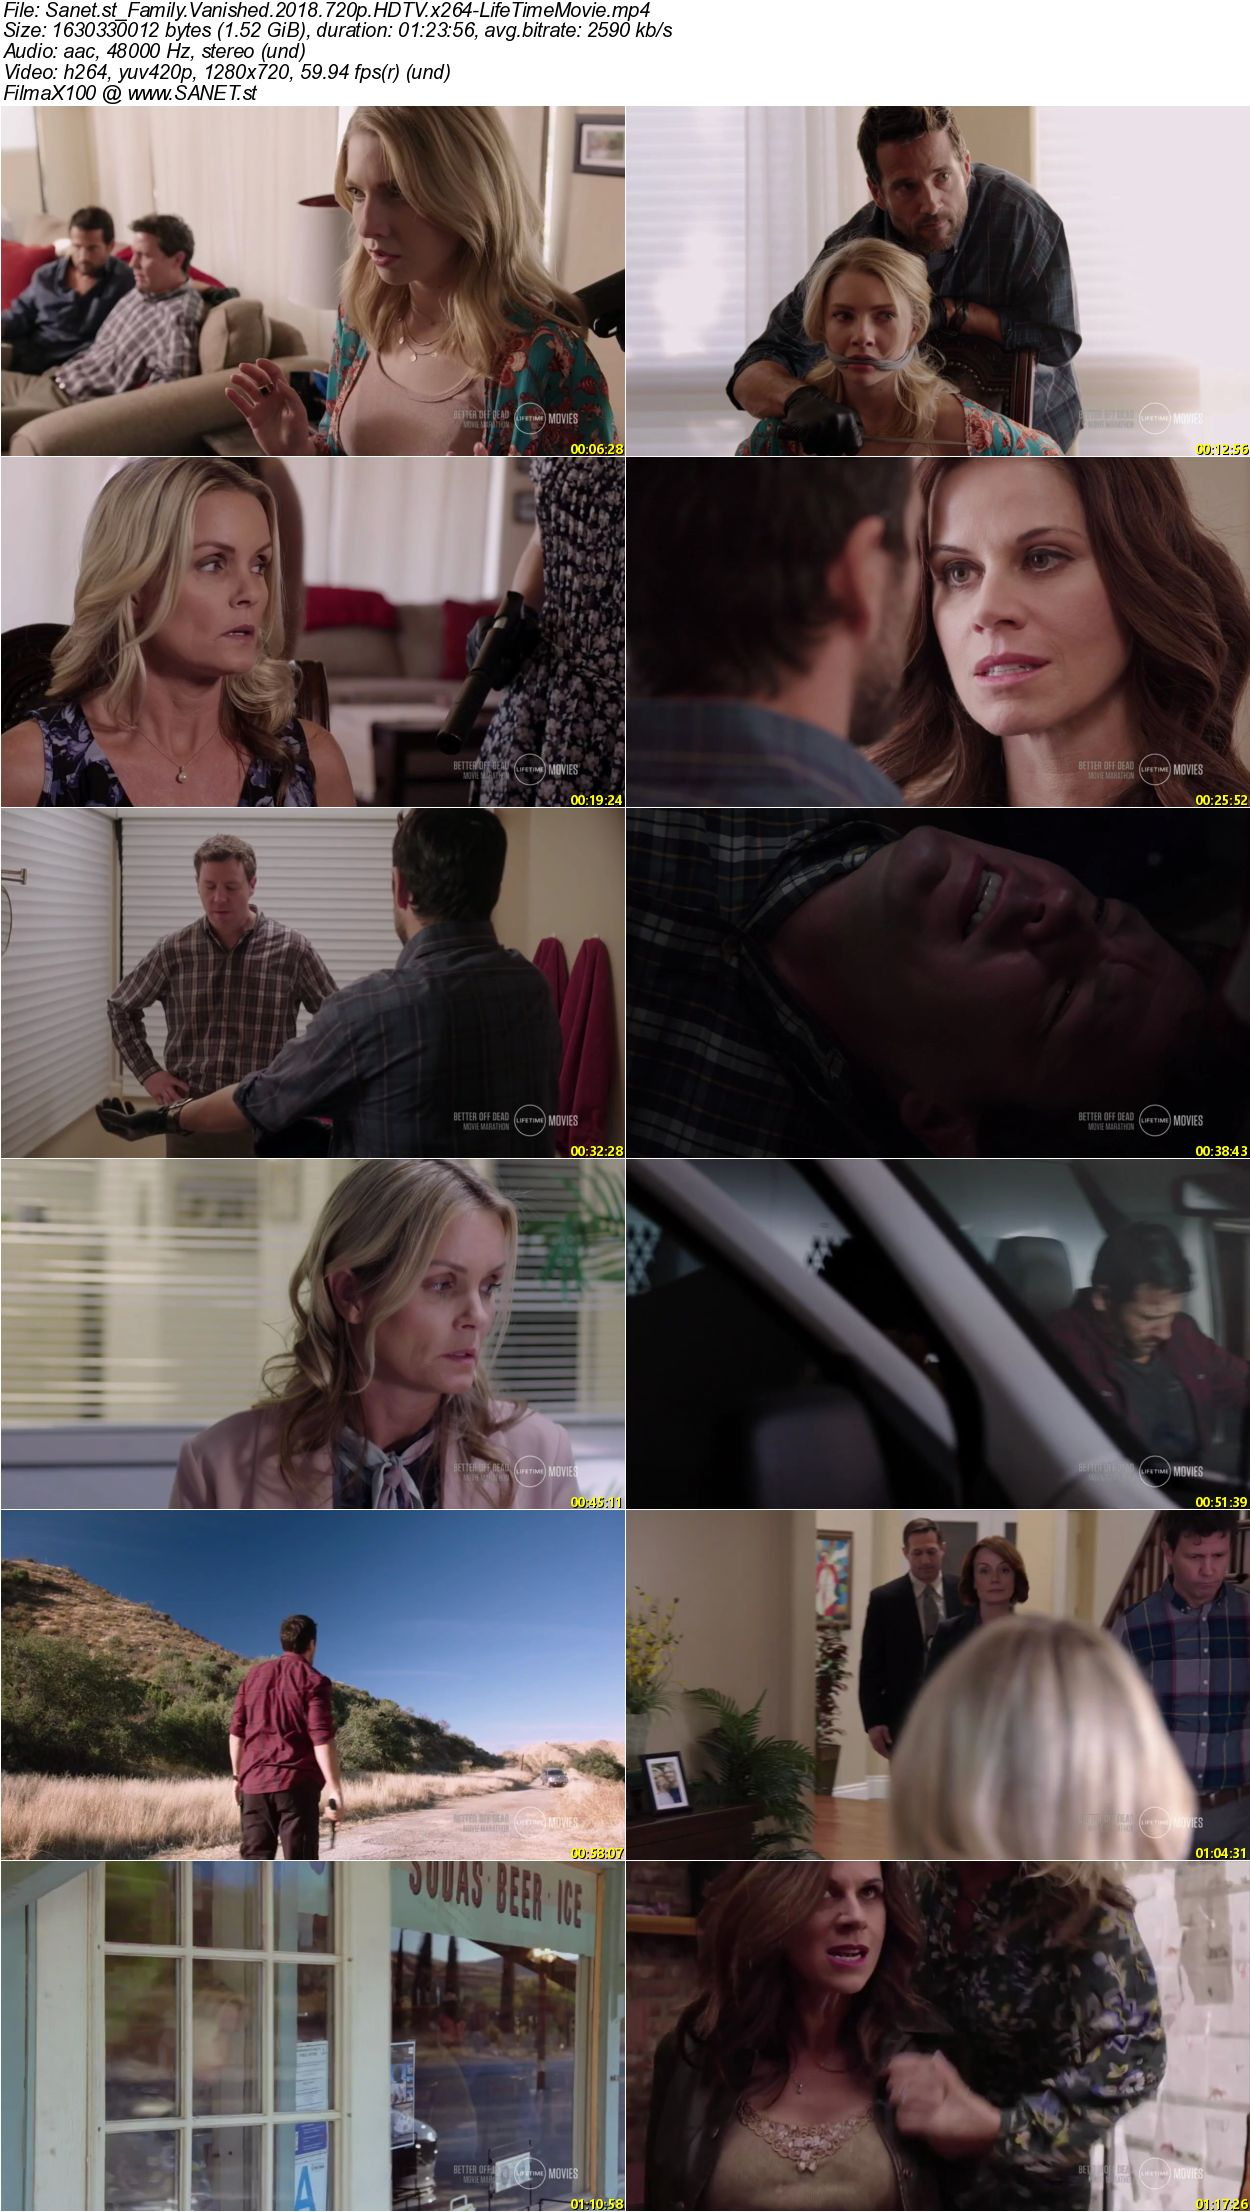 Download Family Vanished 2018 720p HDTV x264-LifeTimeMovie - SoftArchive